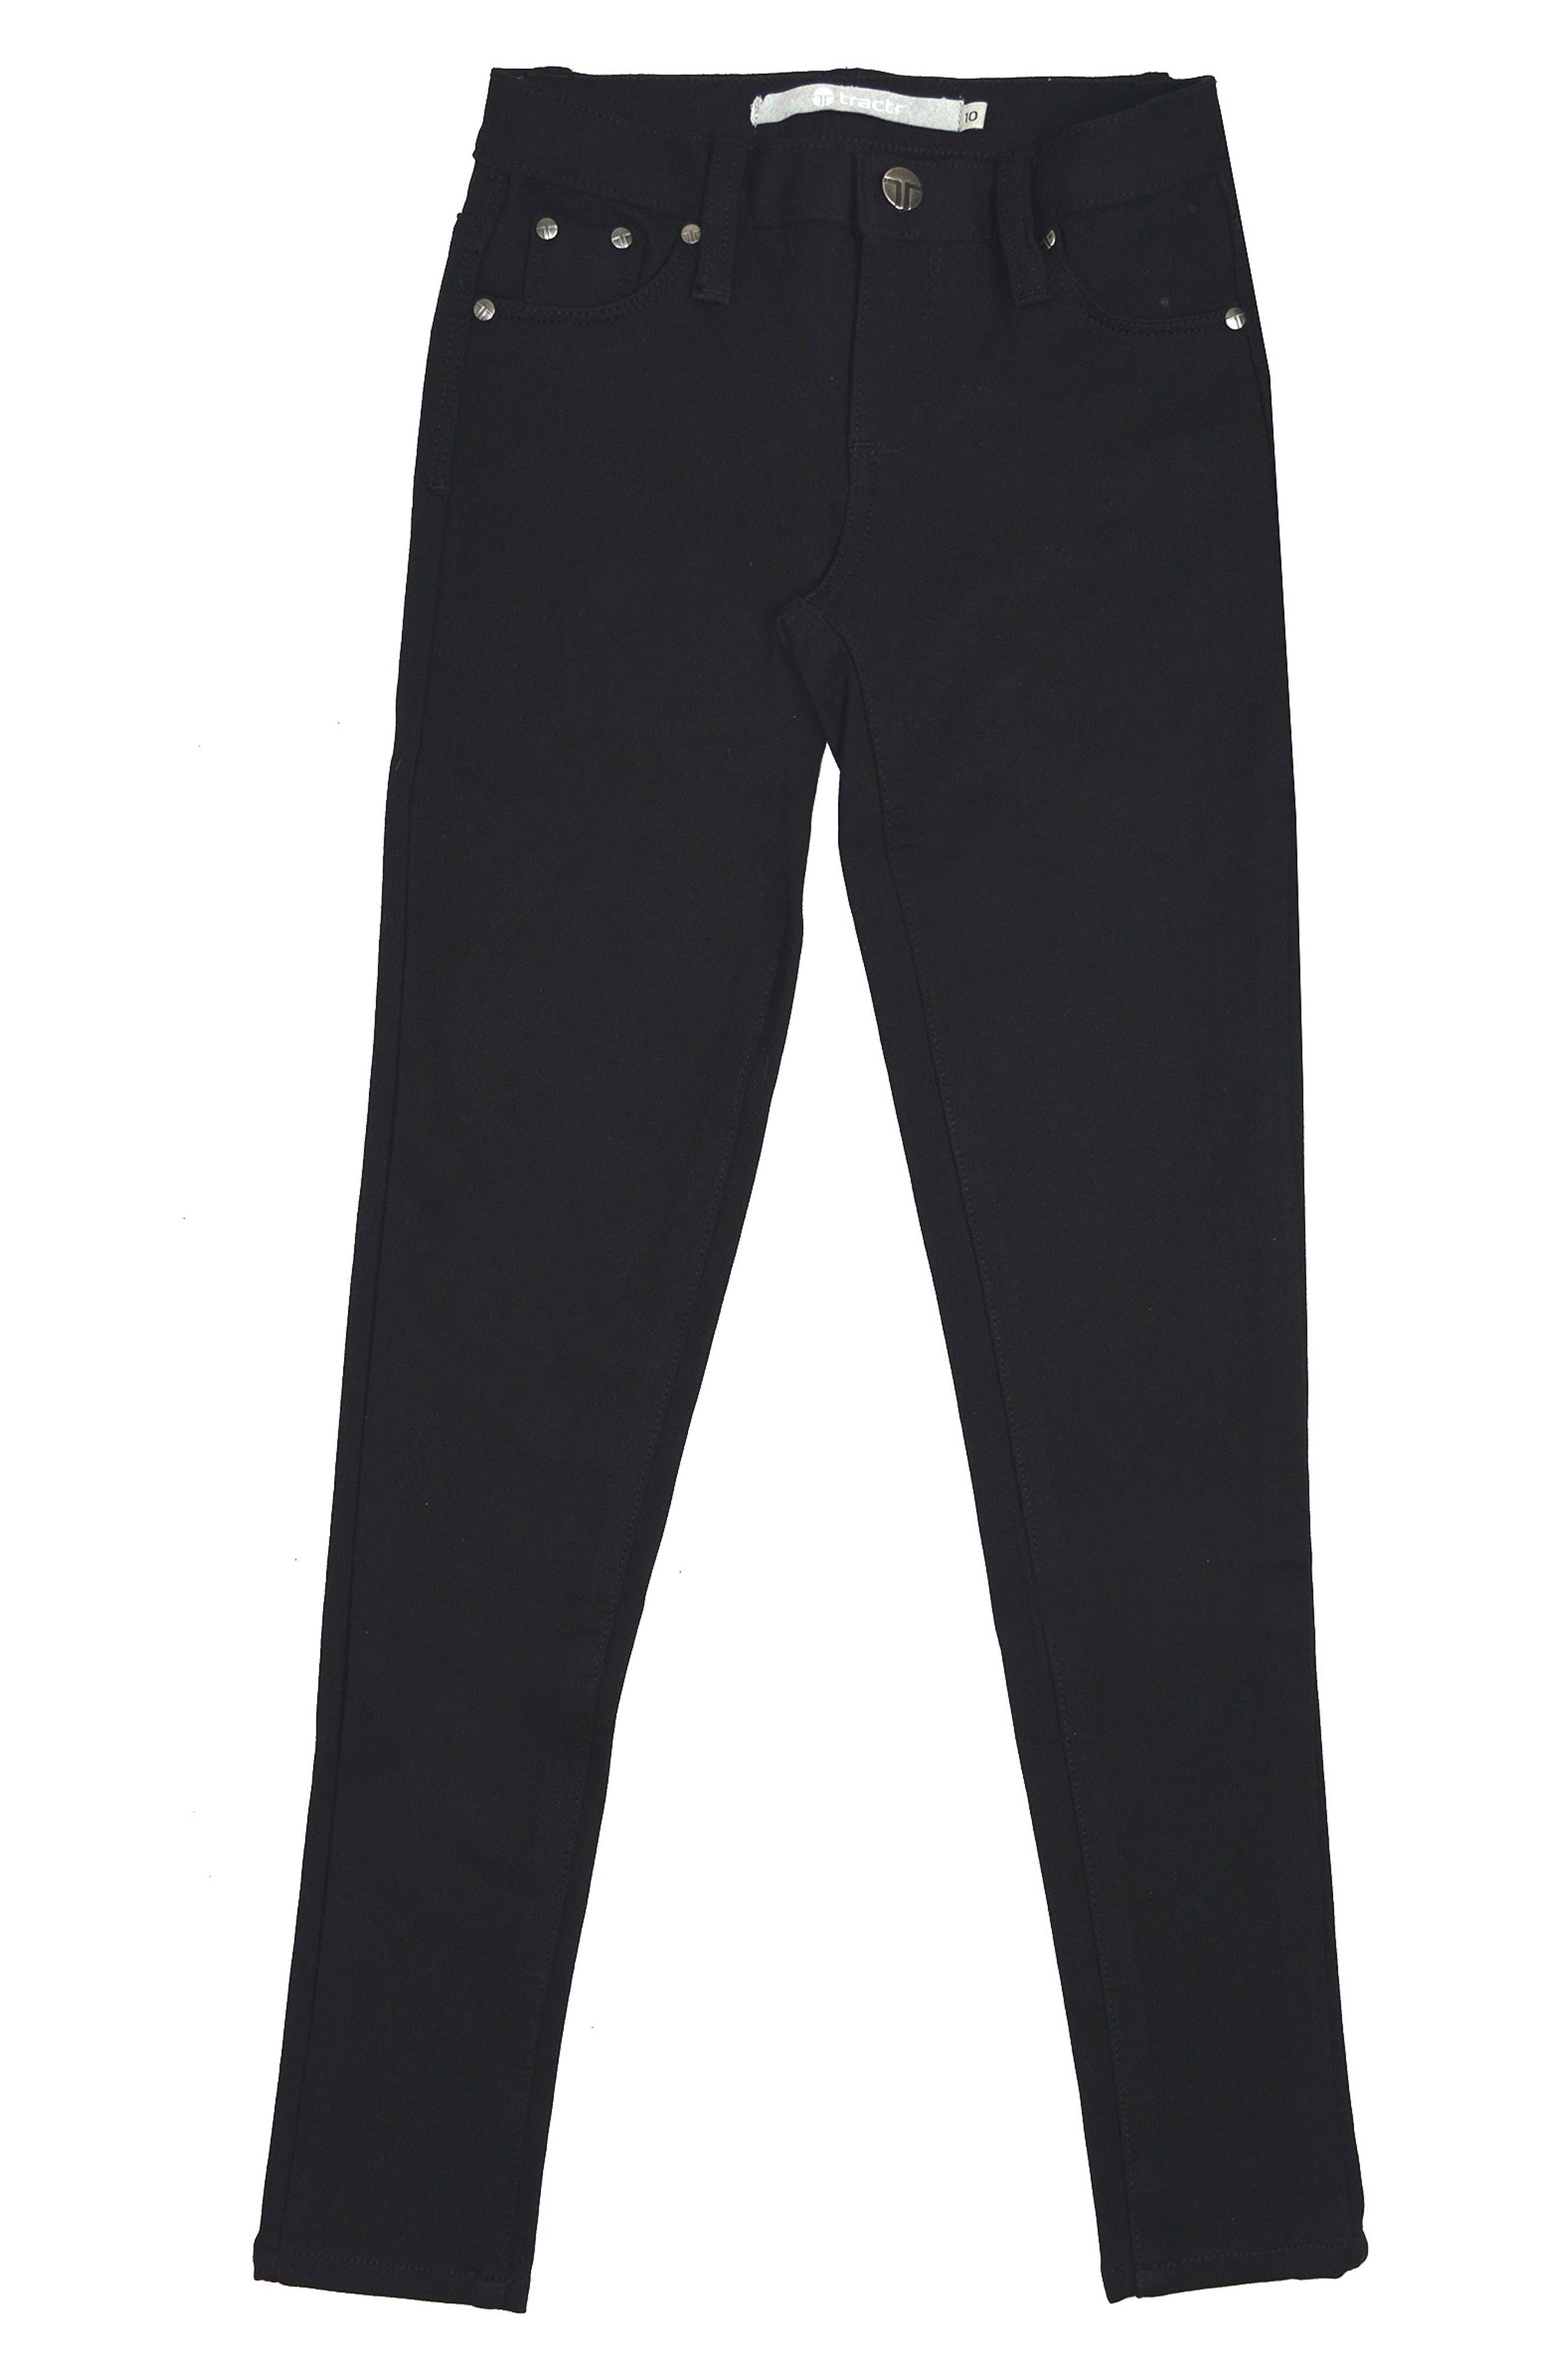 Ponte Skinny Jeans,                         Main,                         color, Black